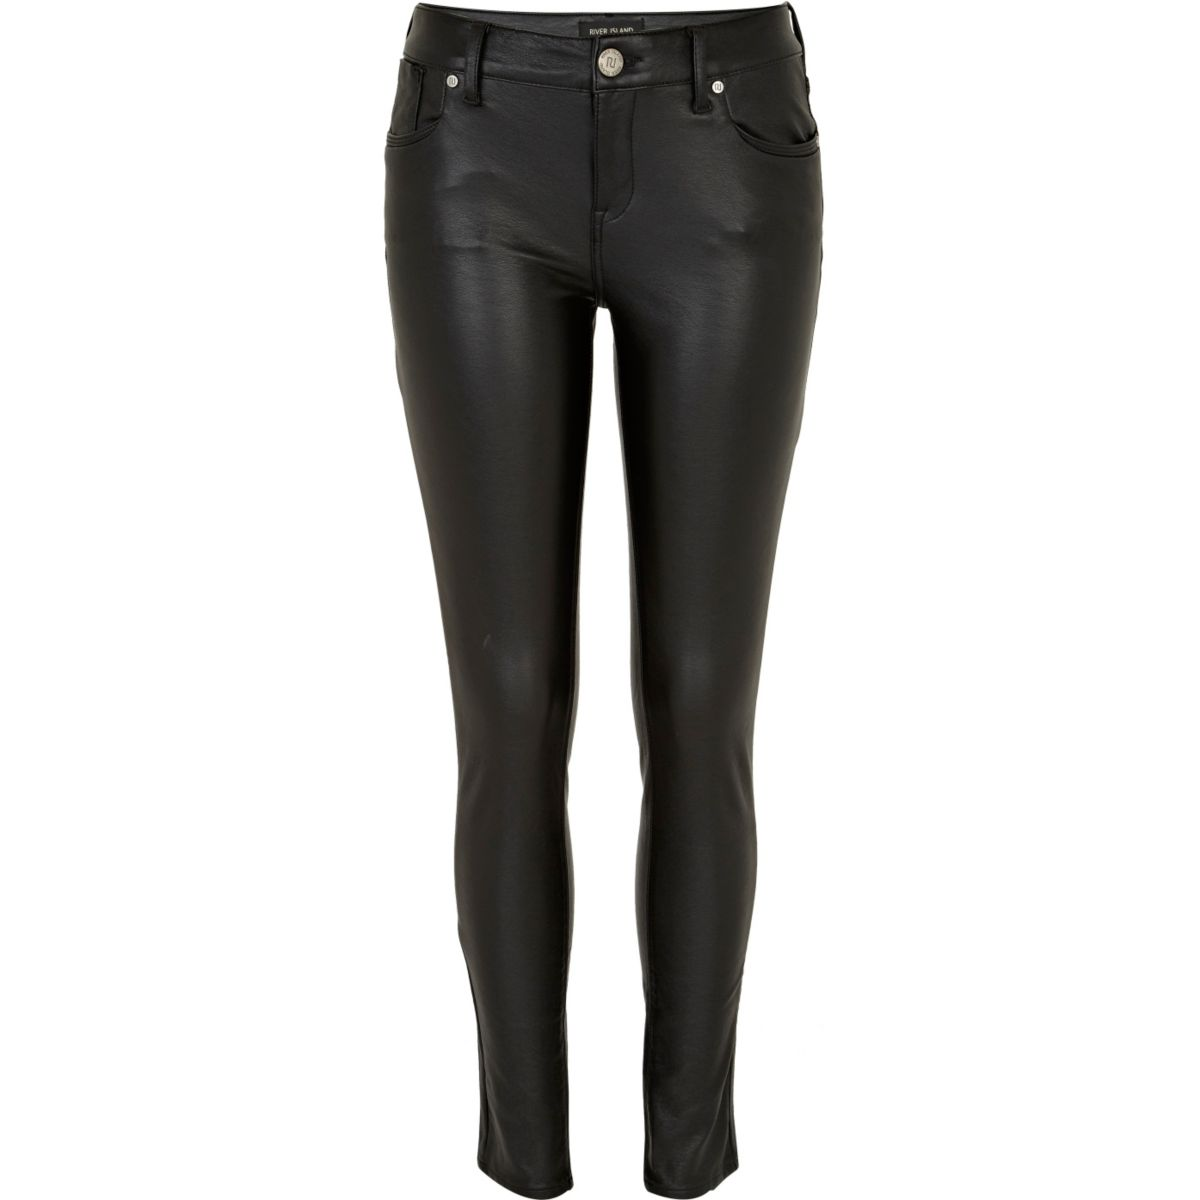 Black leather look Olive super skinny jeans